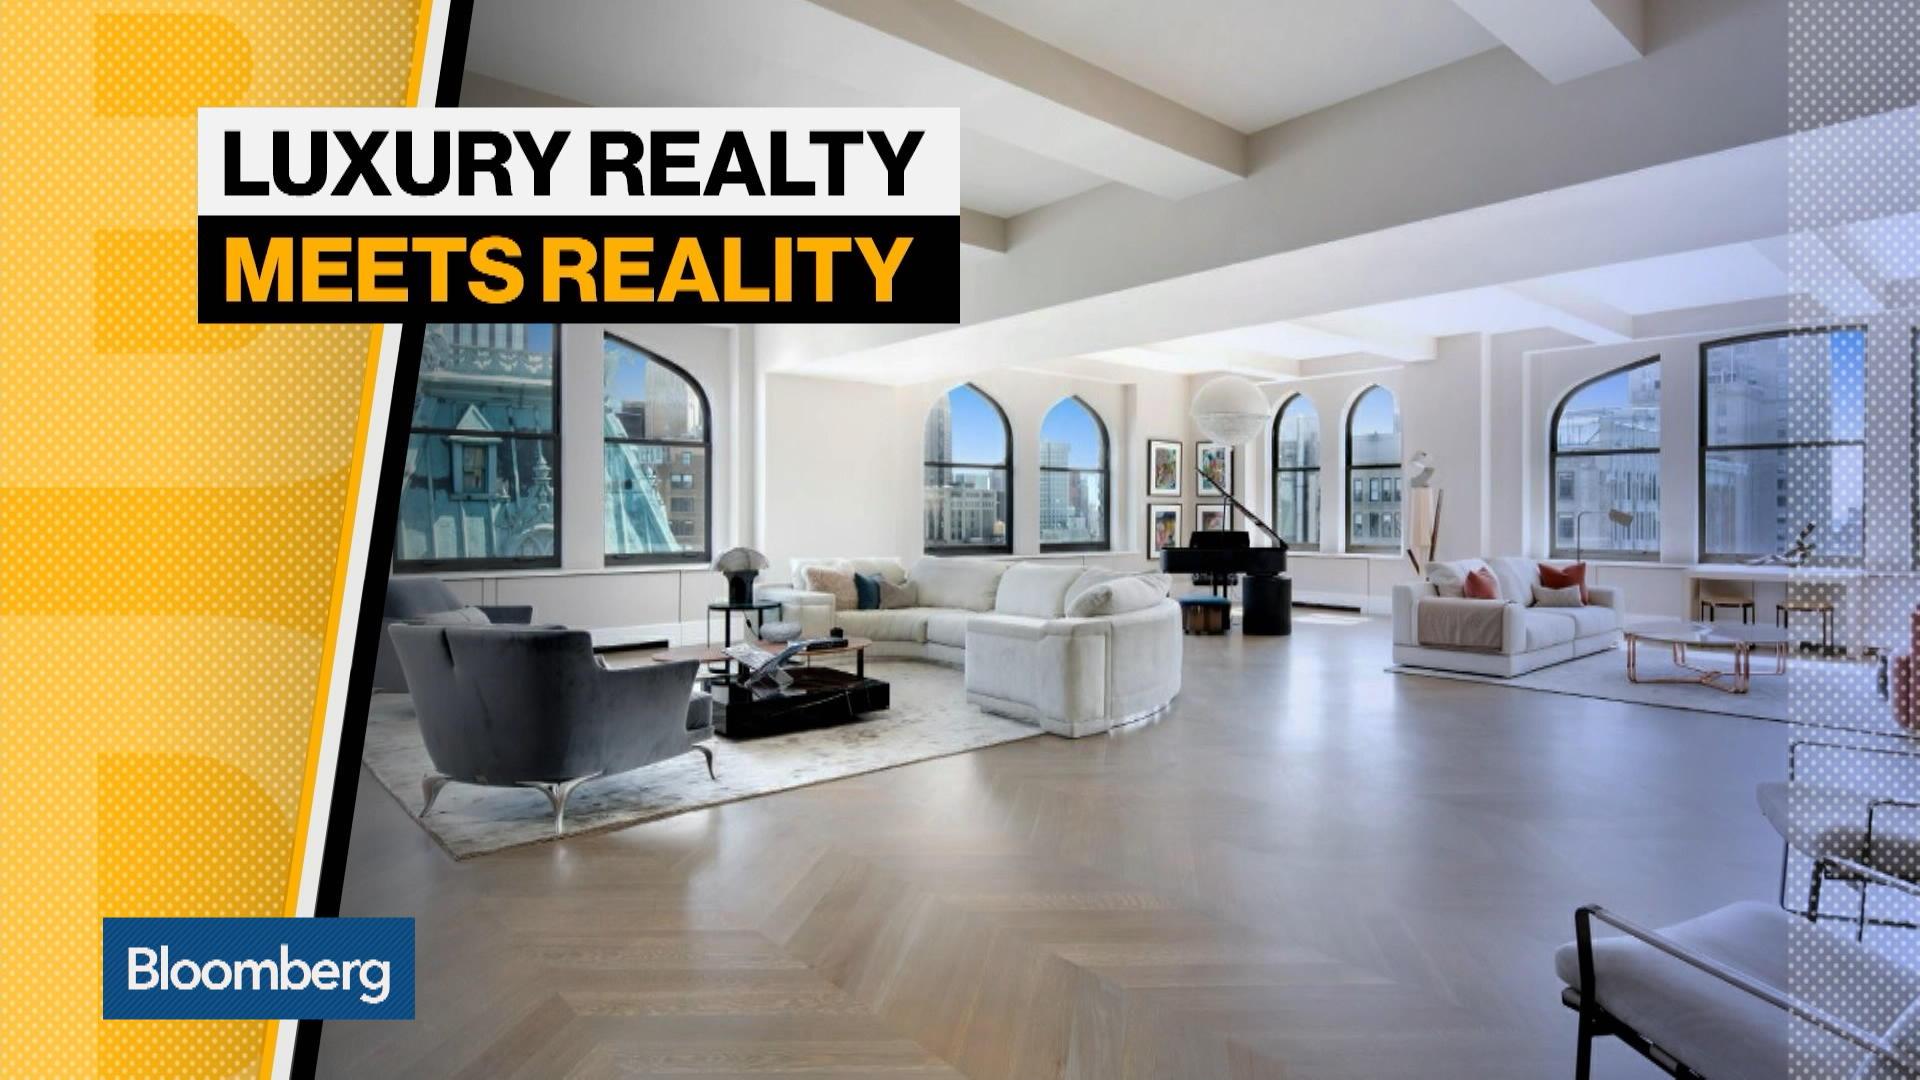 $62 Million Manhattan Penthouse Faces Luxury Realty Reality